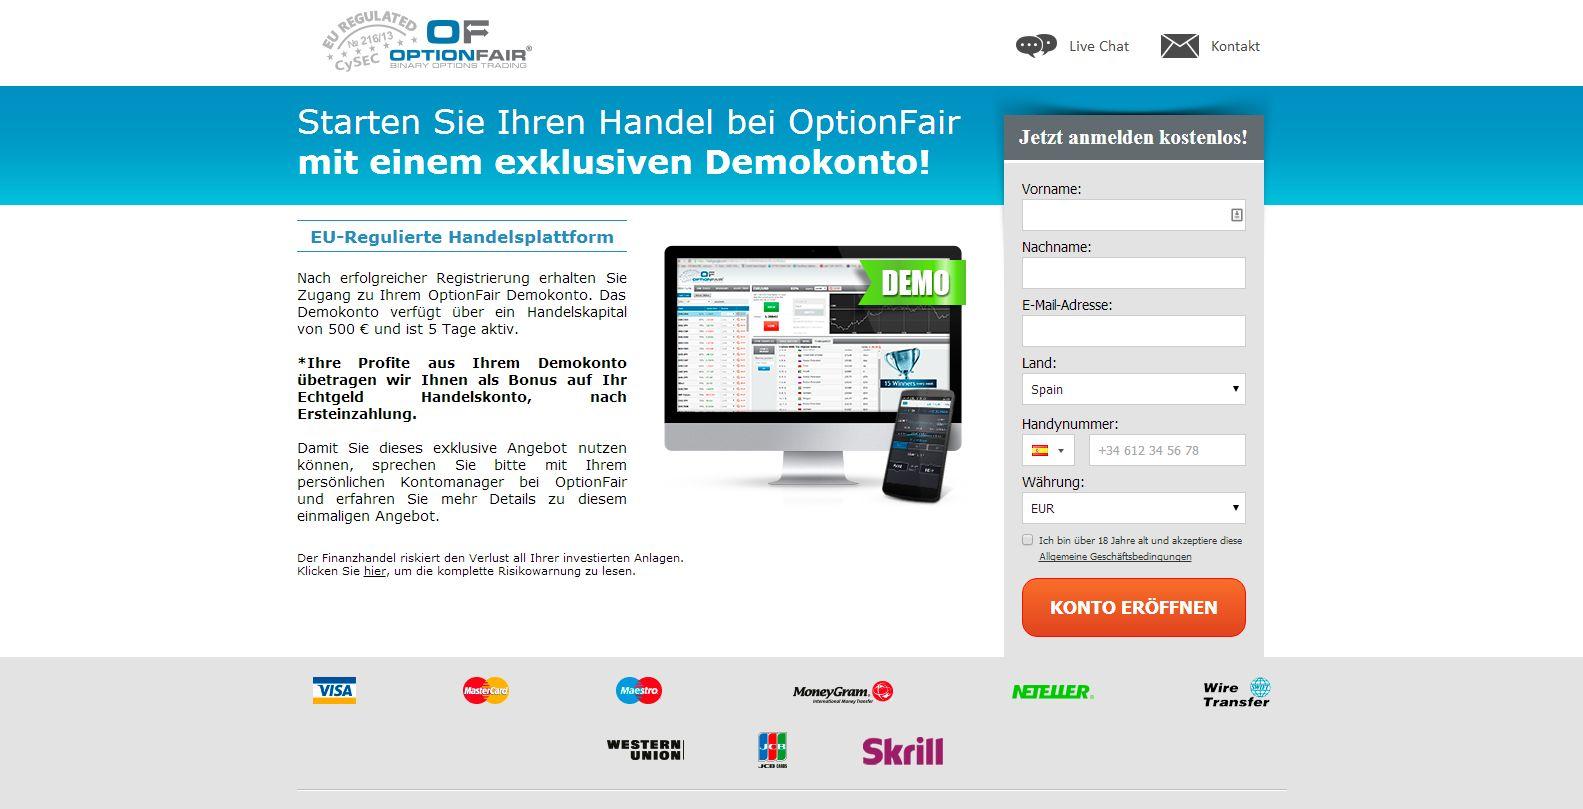 OptionFair Demokonto